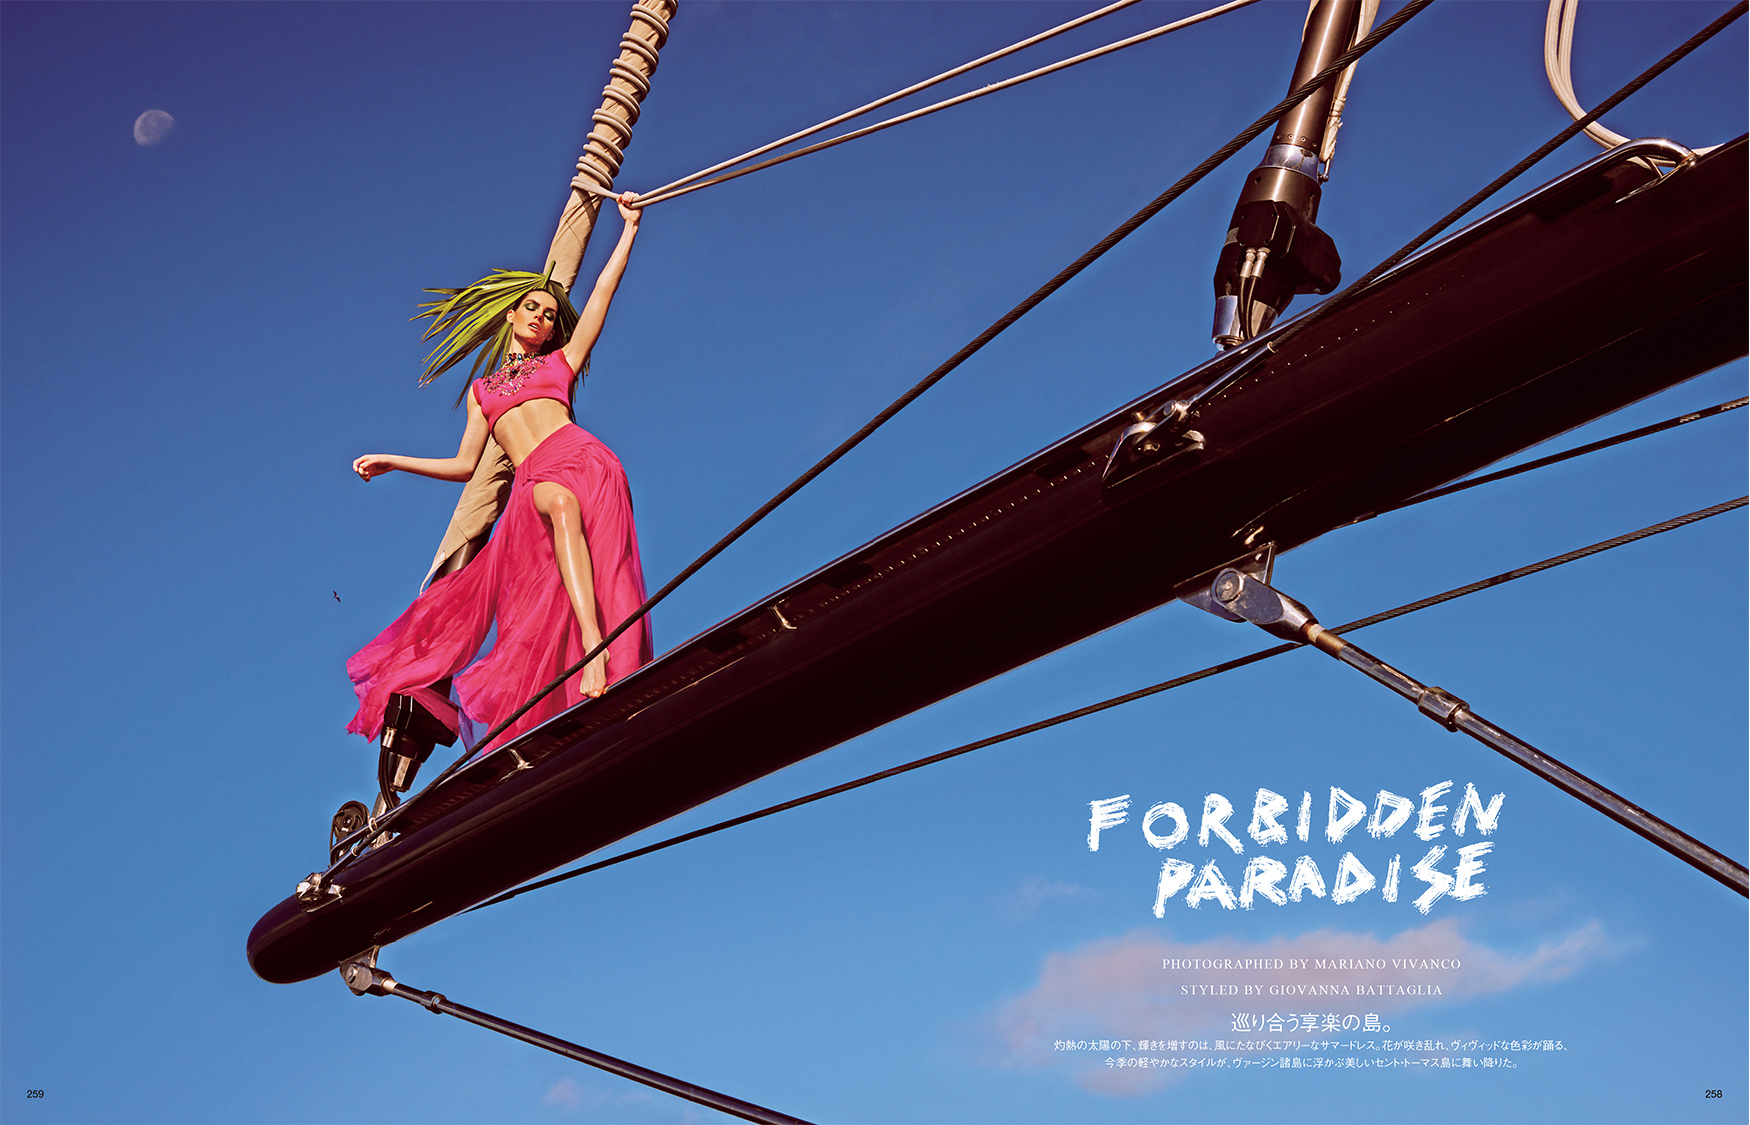 Giovanna-Battaglia-Vogue-Japan-Mariano-Vivanco-Forbidden-Paradise-1.jpg